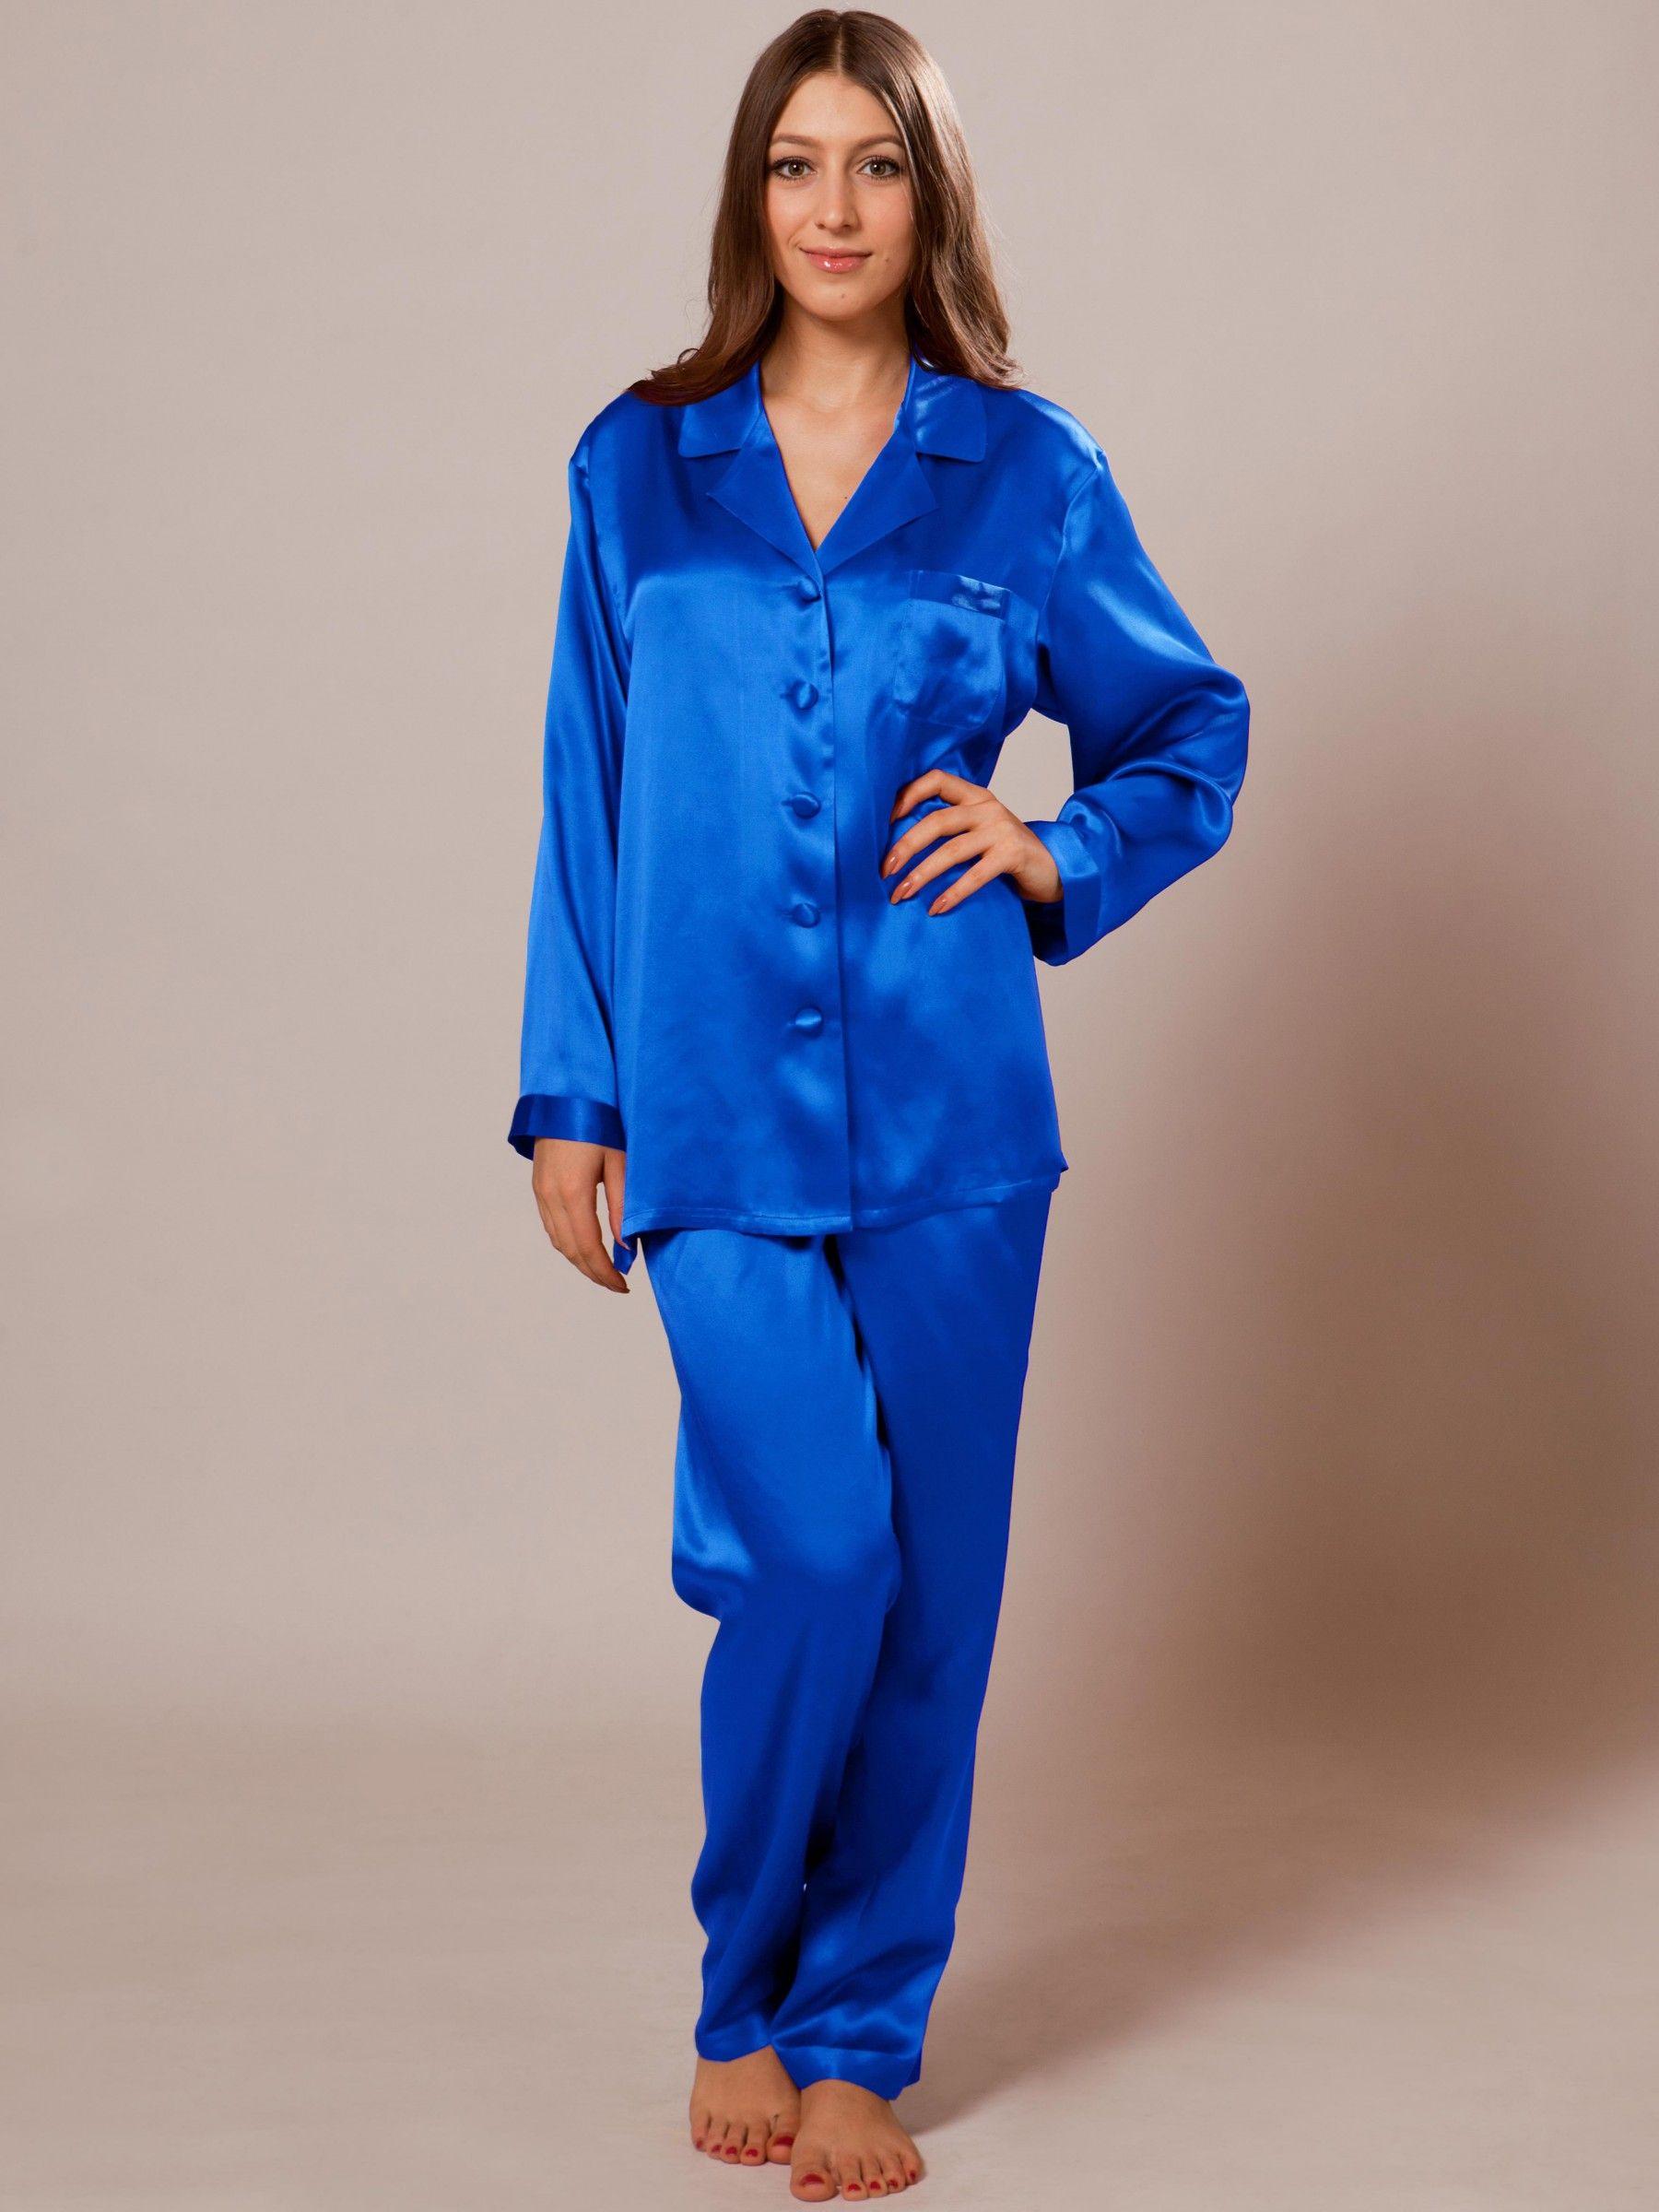 22 Momme Laced Silk Pajama Set - Sleepwear | Silk pajama